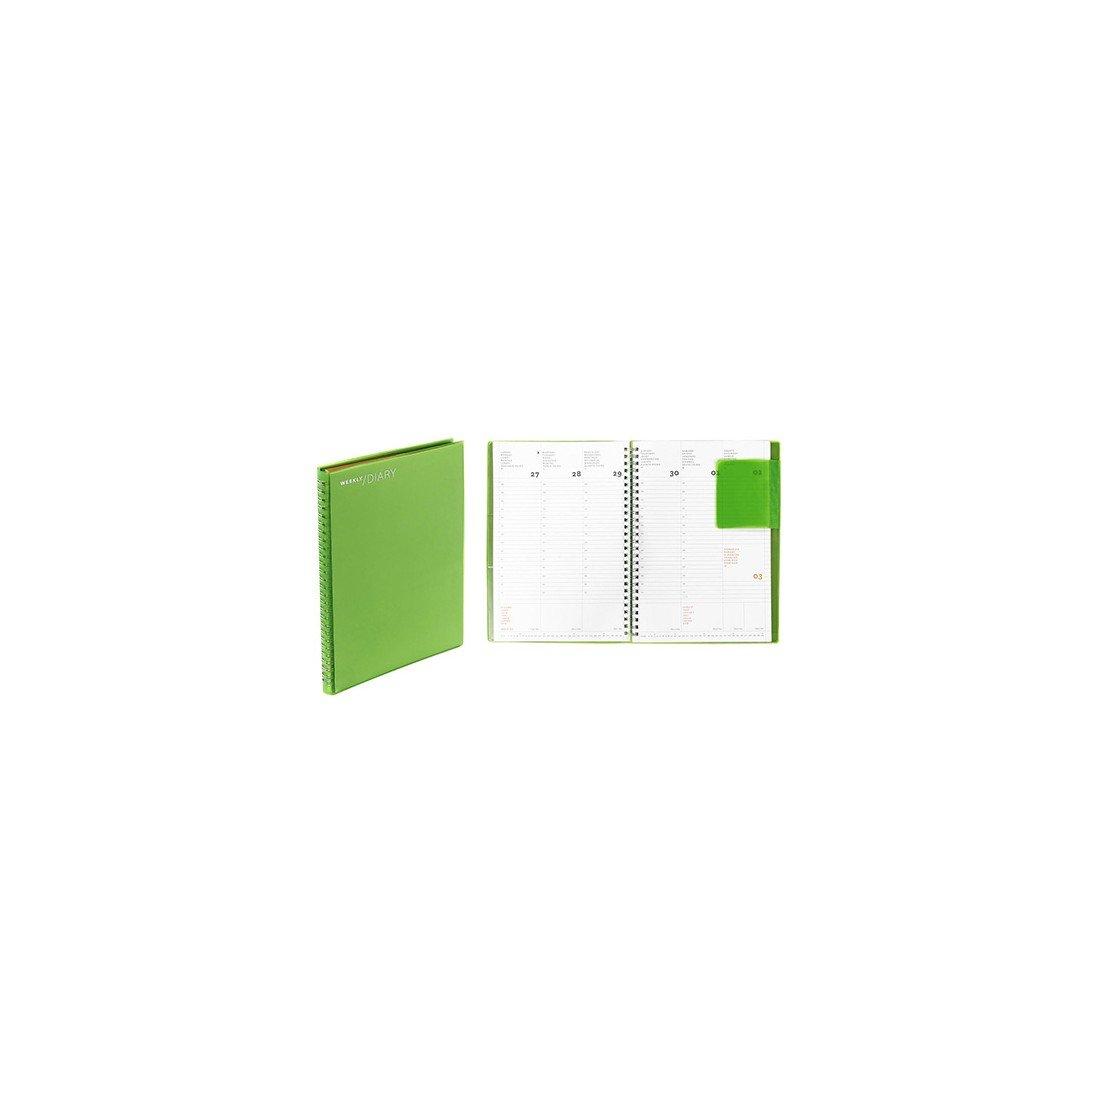 2019 AGENDA NAVA SETT. 17x24cm WORK 7 MEDIUM SPIRALE PVC GREEN